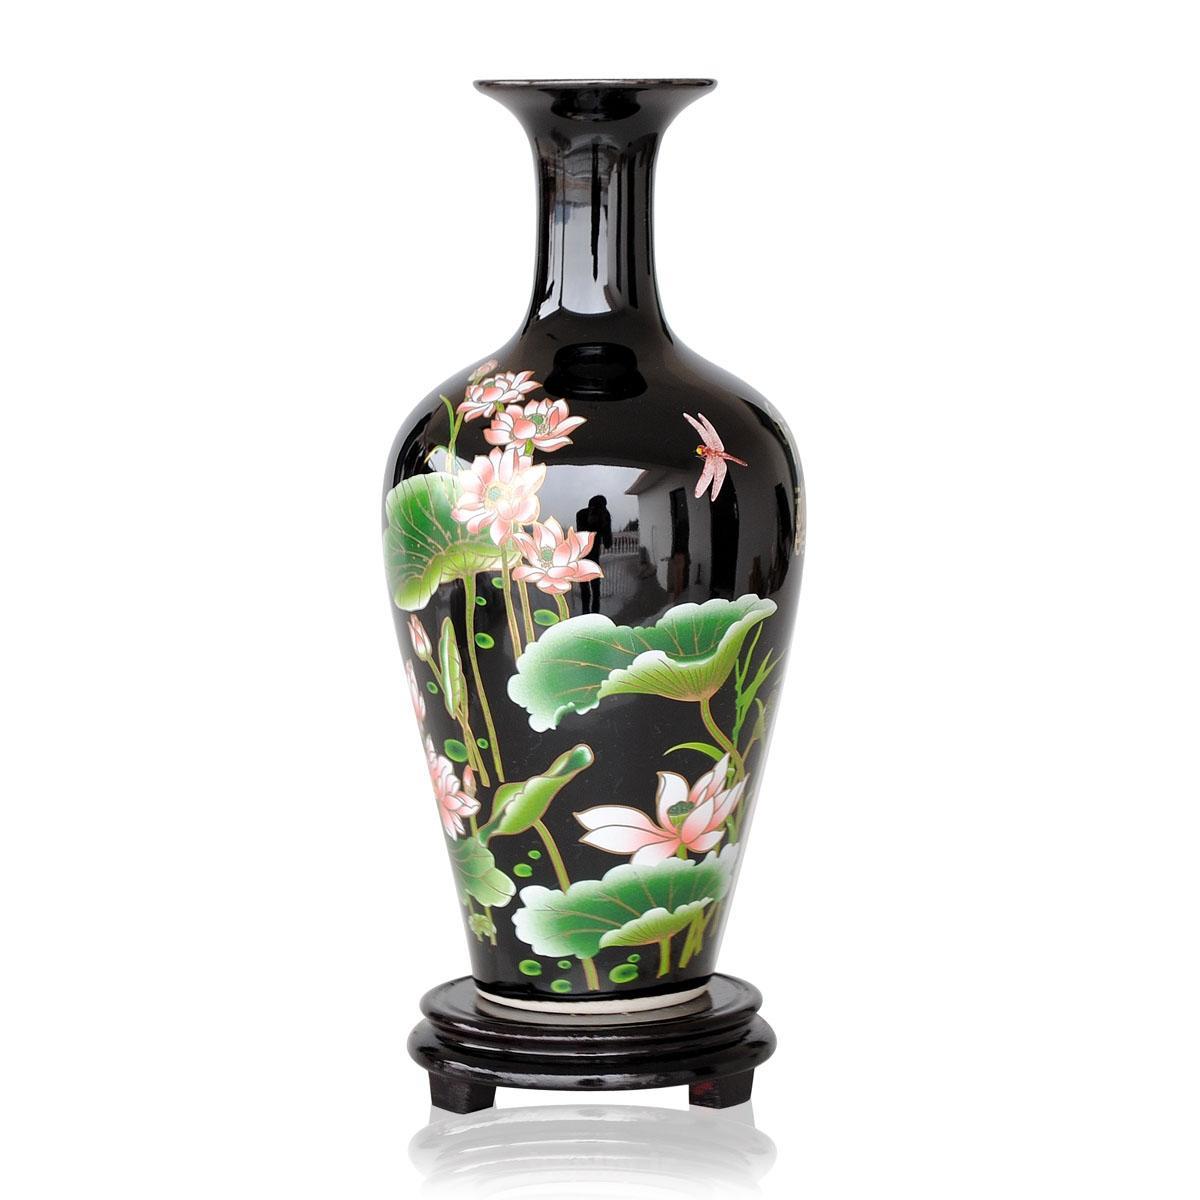 vases 14 Beautiful Vases